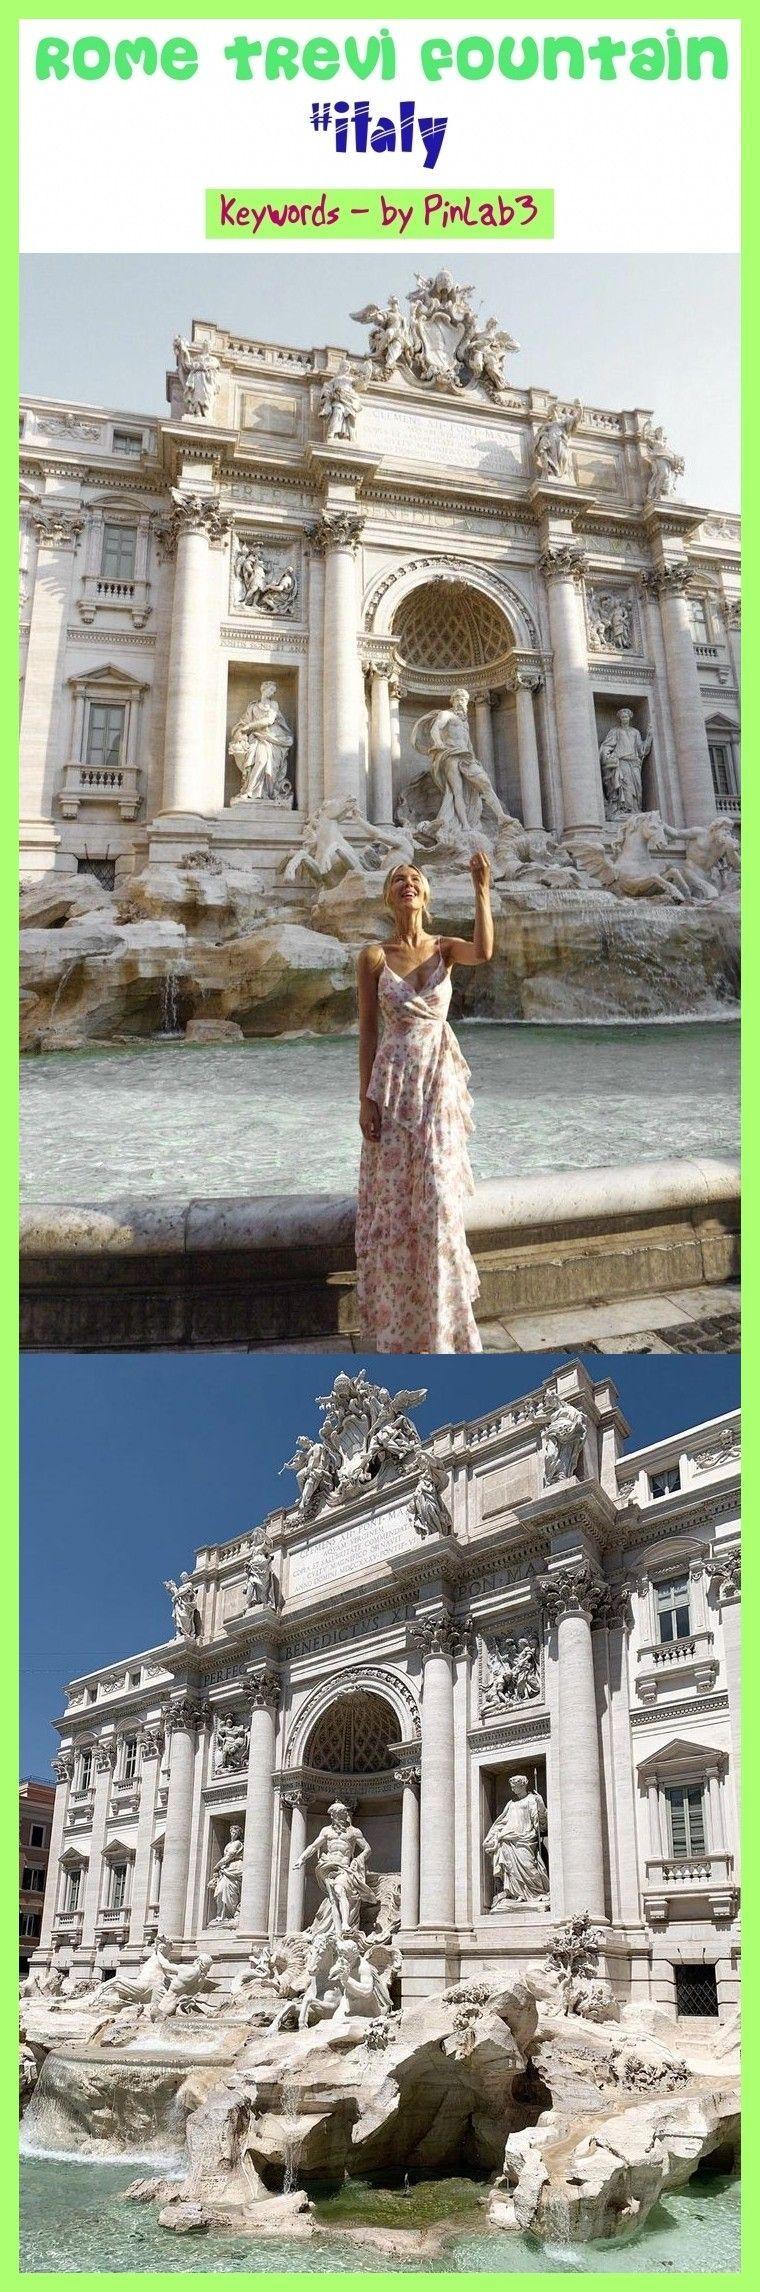 Rome Trevi Fountain Trevi Fountain Rom Trevi Brunnen Fontaine De Rome Trevi Fuente De Roma Tre Brunne In 2020 Rome Nightlife Rome Photography Rome Pictures